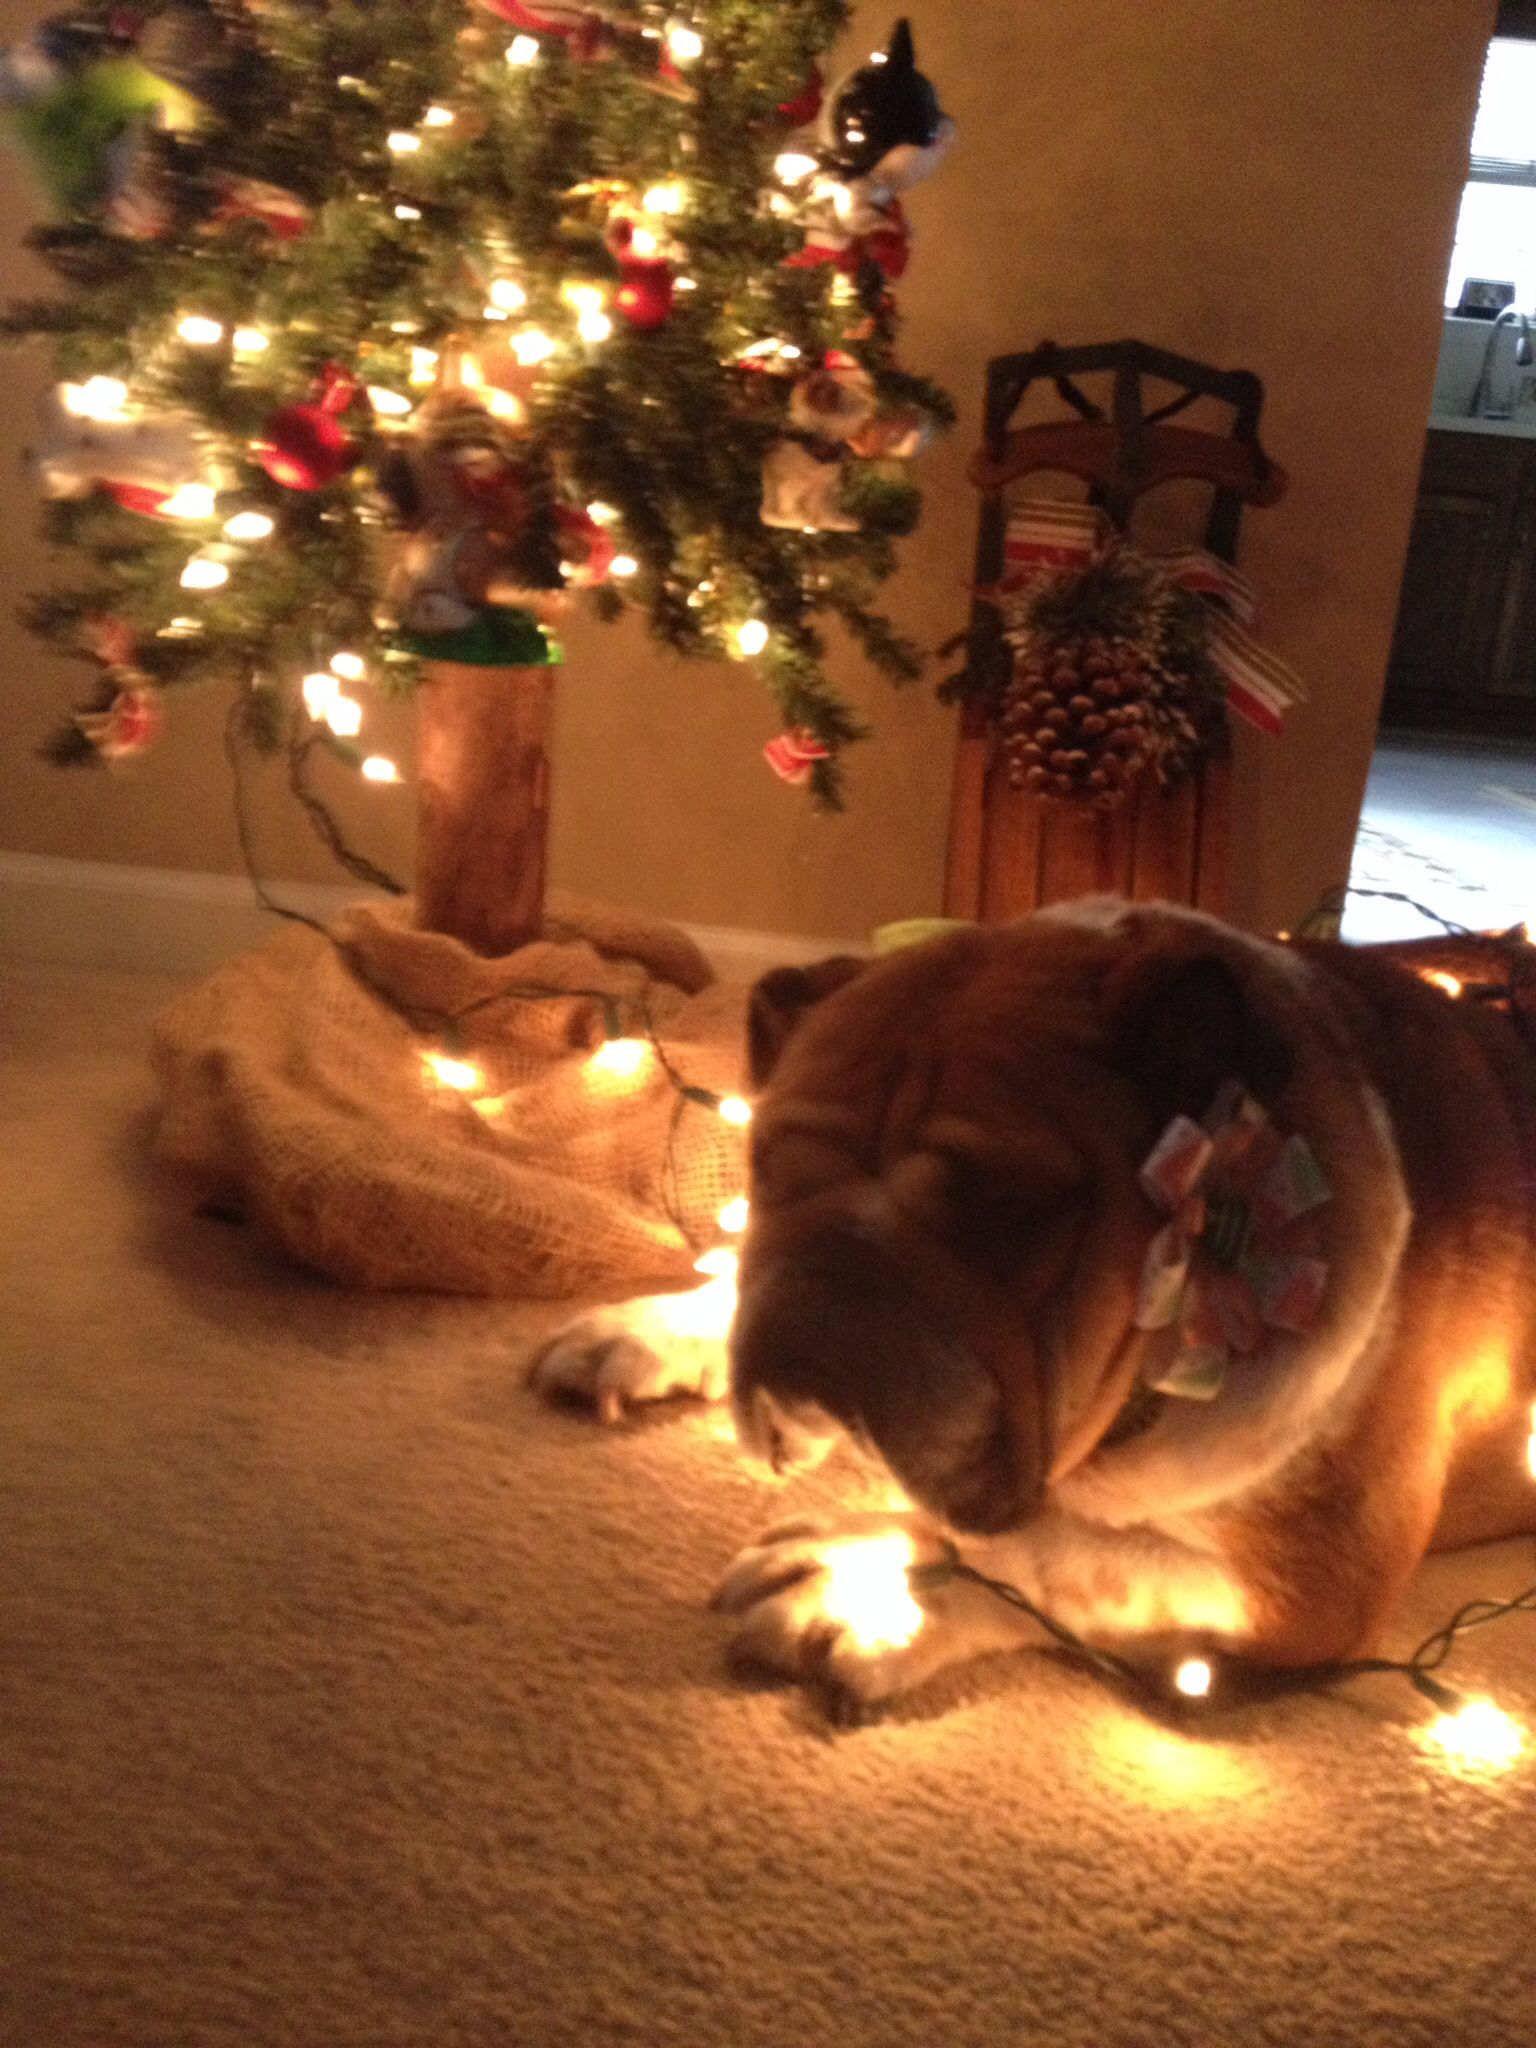 Reba looking festive!